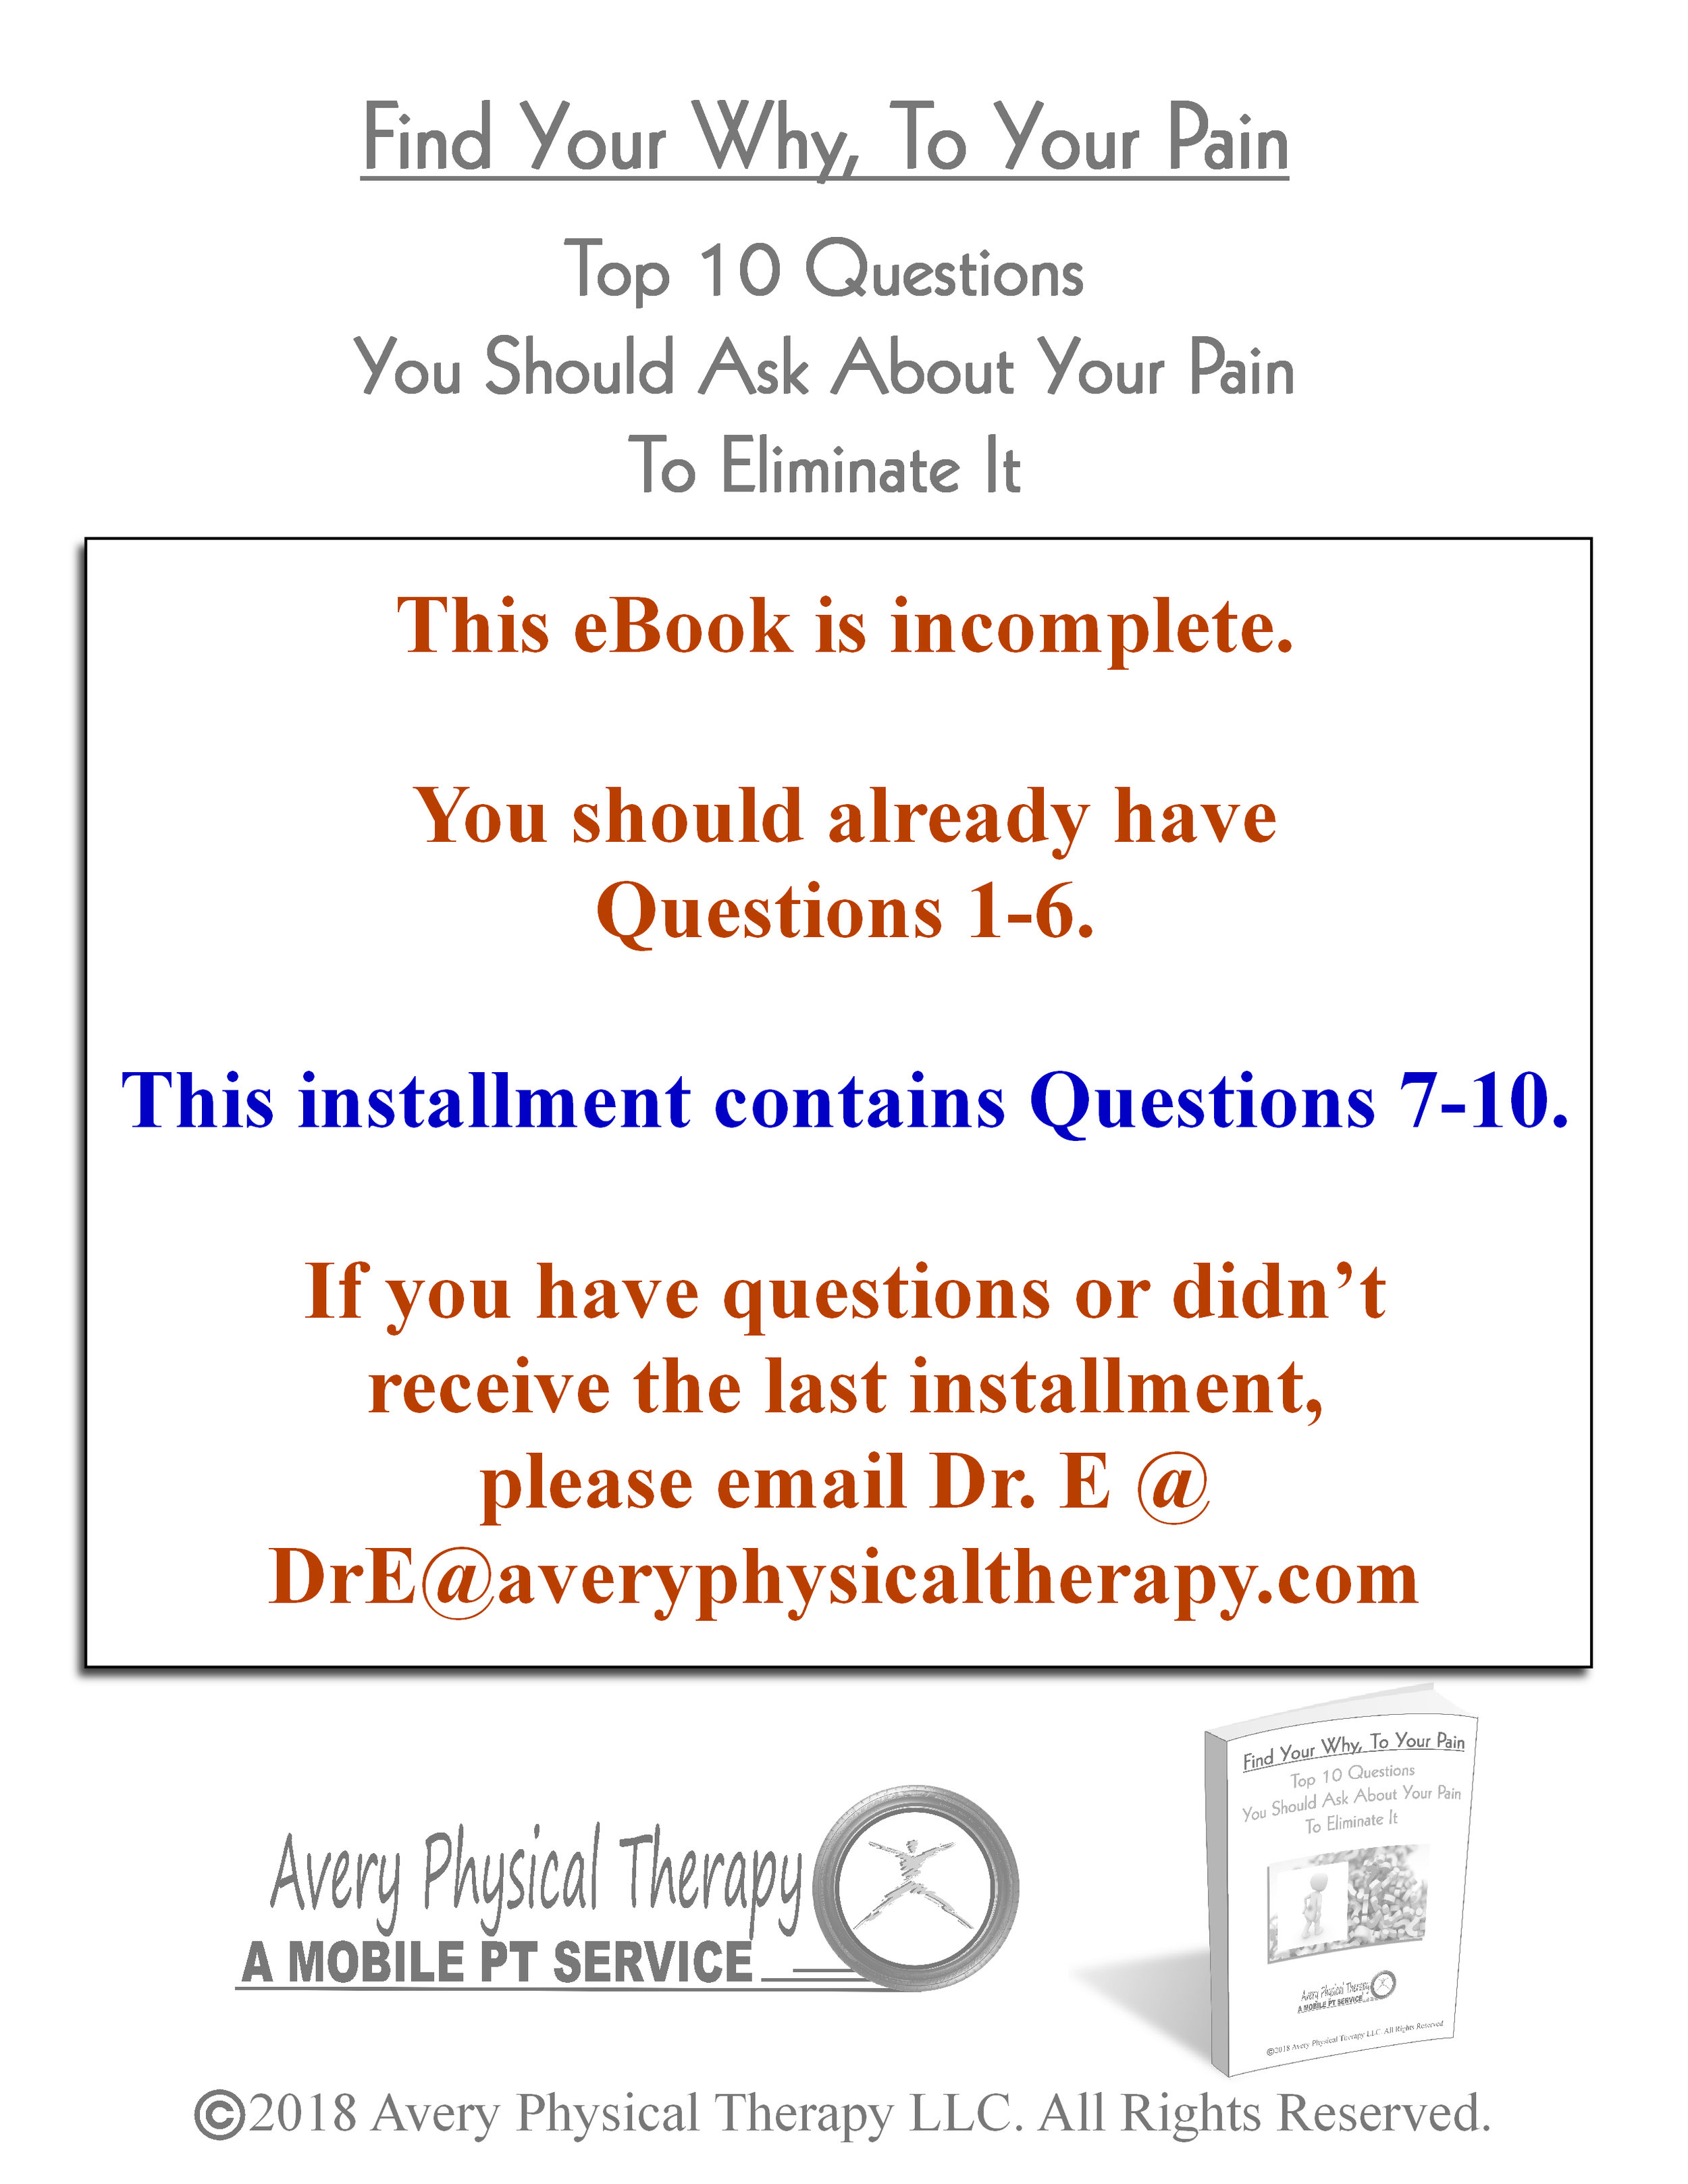 Top 10 Pain Questions 7-10D.JPG